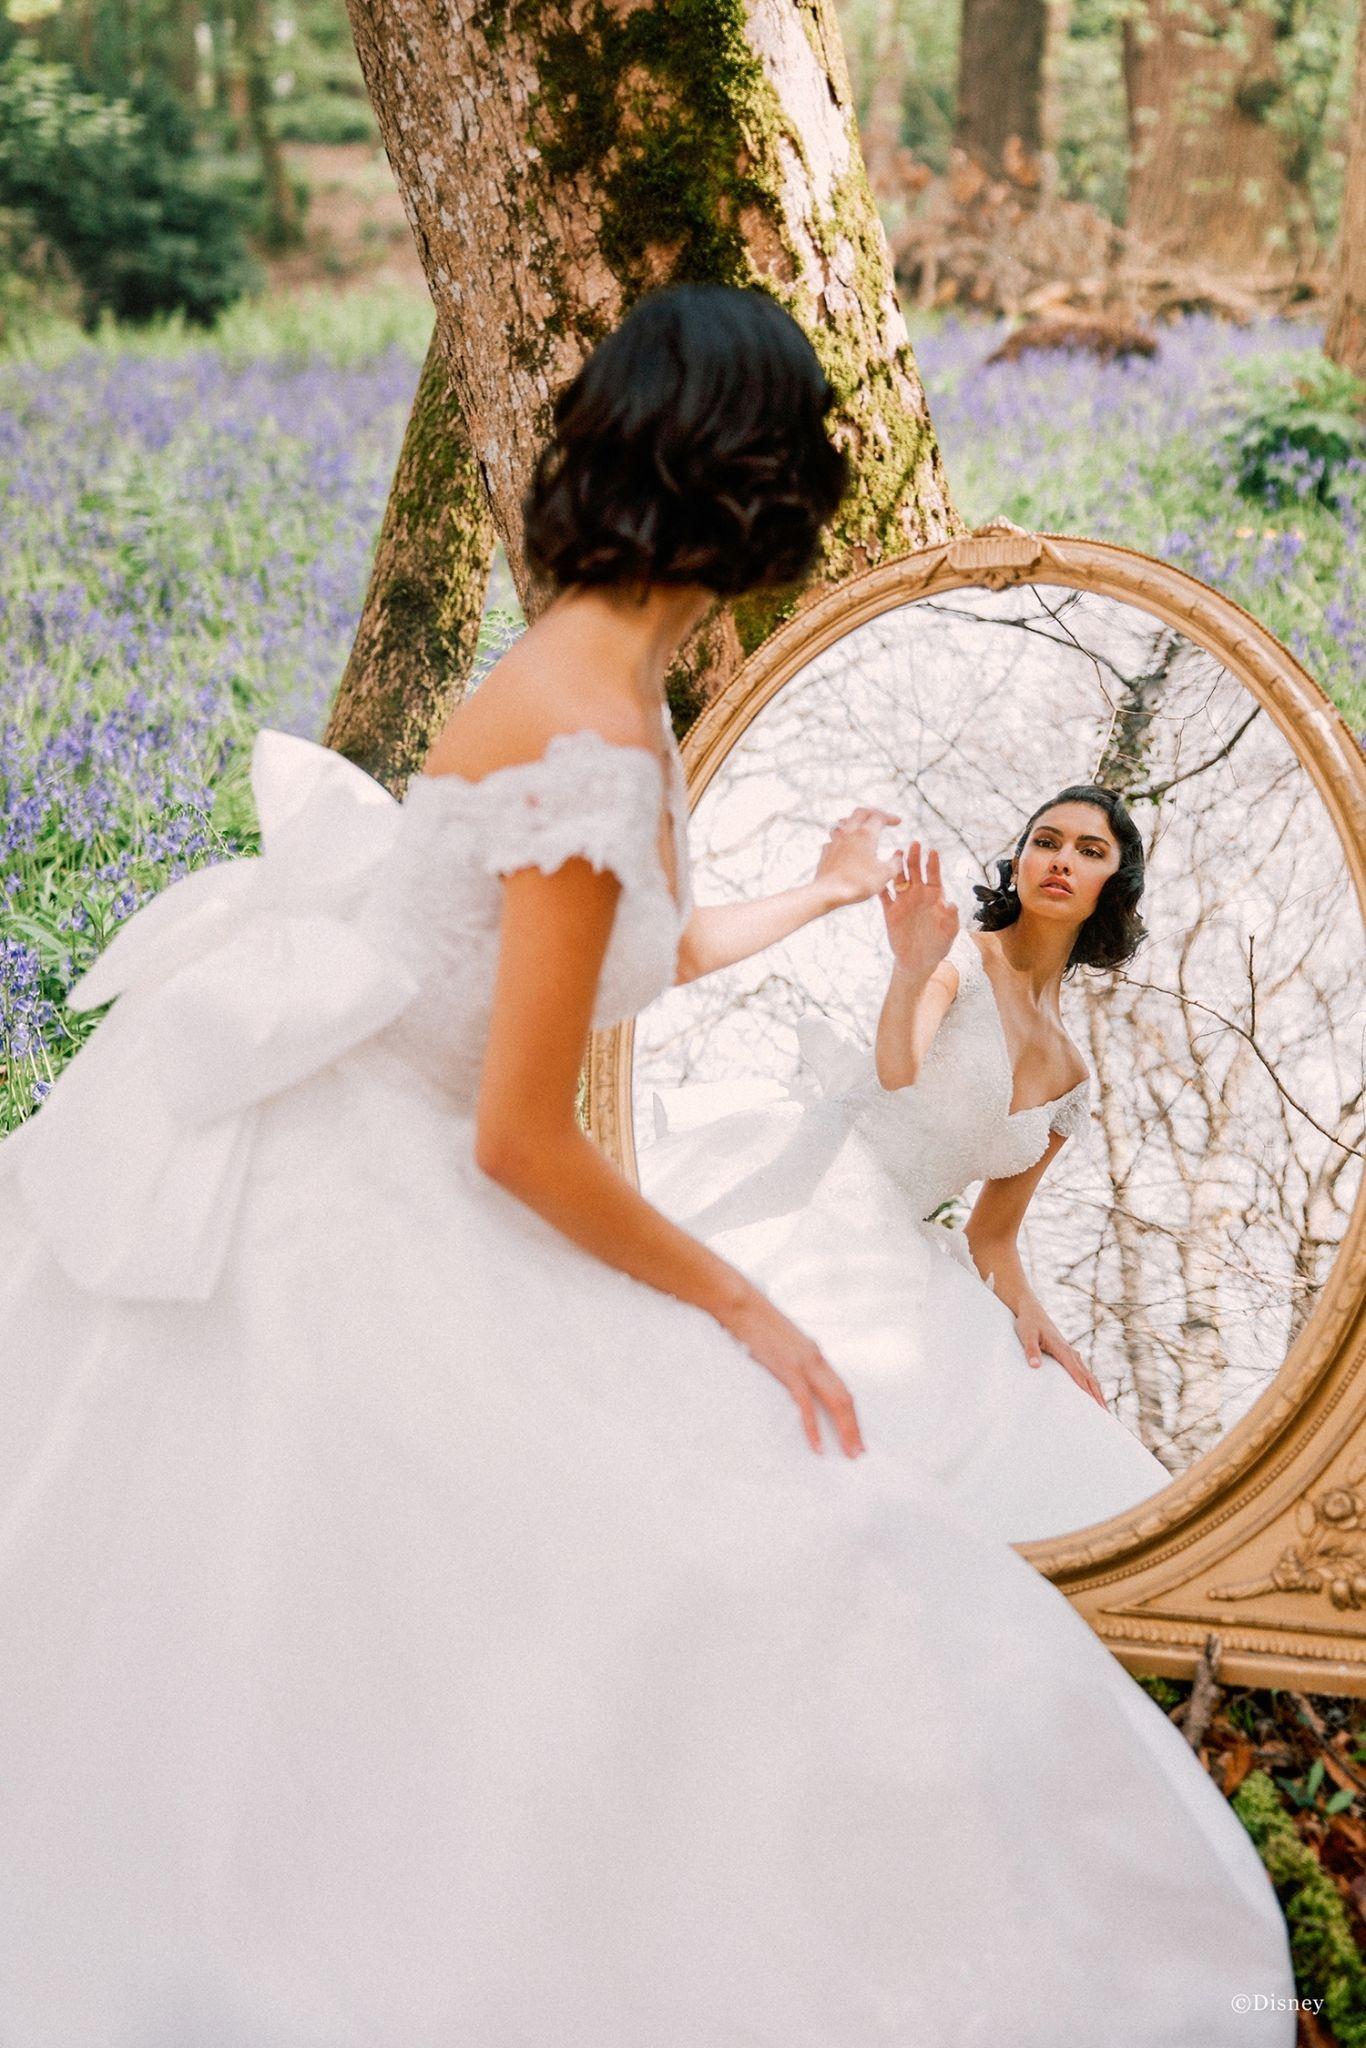 Style Dp255 Snow White Allure Bridals Disney Wedding Dresses Snow White Wedding Disney Inspired Wedding Dresses [ 2048 x 1366 Pixel ]